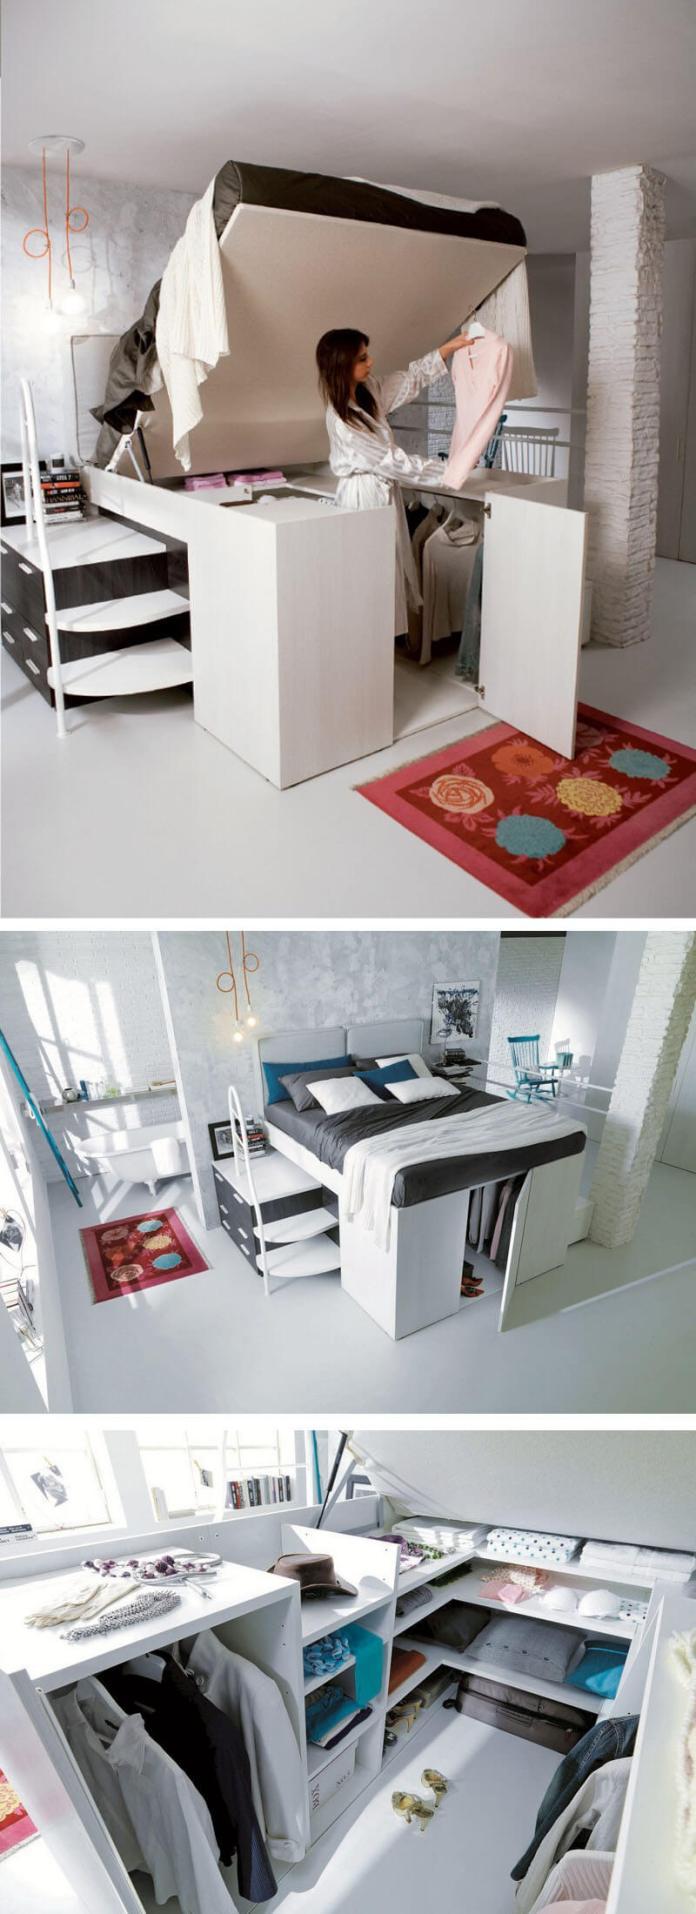 9 Bed and Closet Combo via simphome